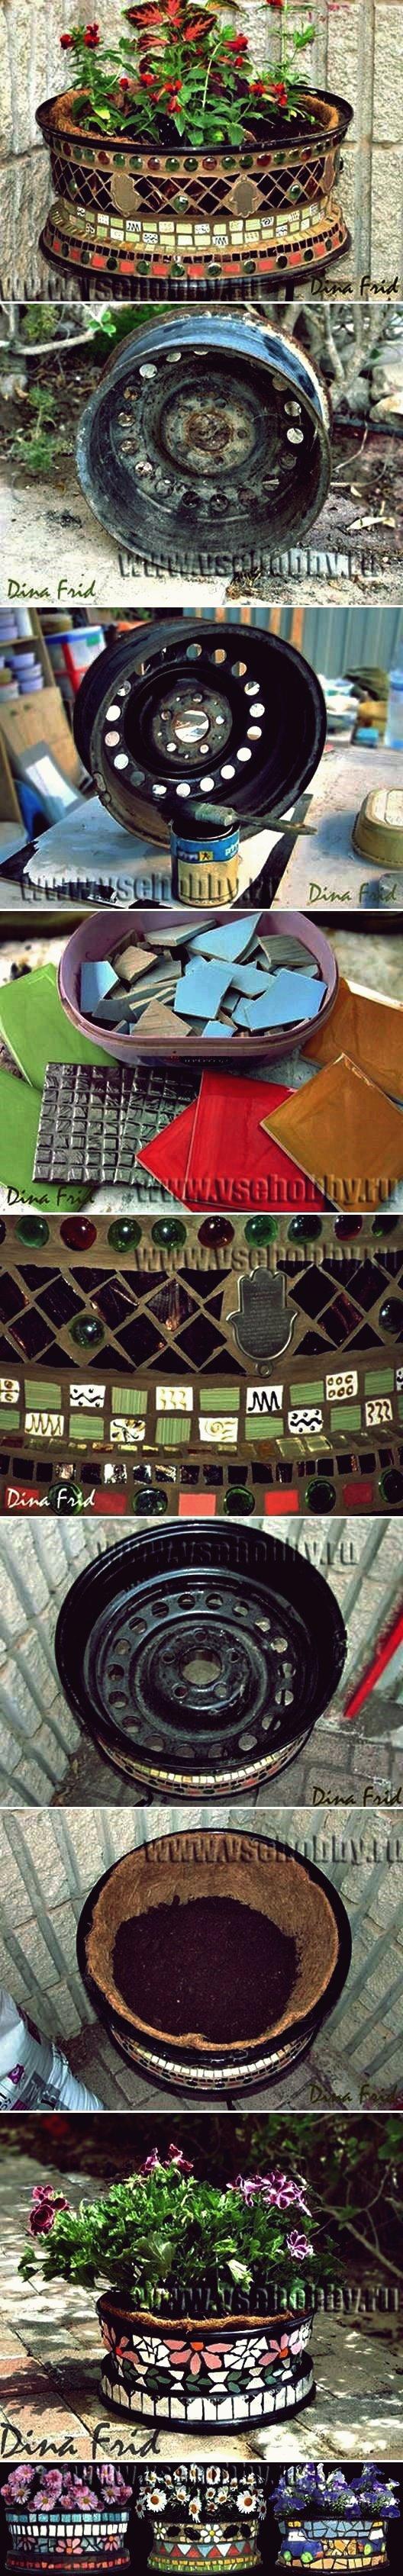 DIY Mosaik-Blumentopf vom alten Rad